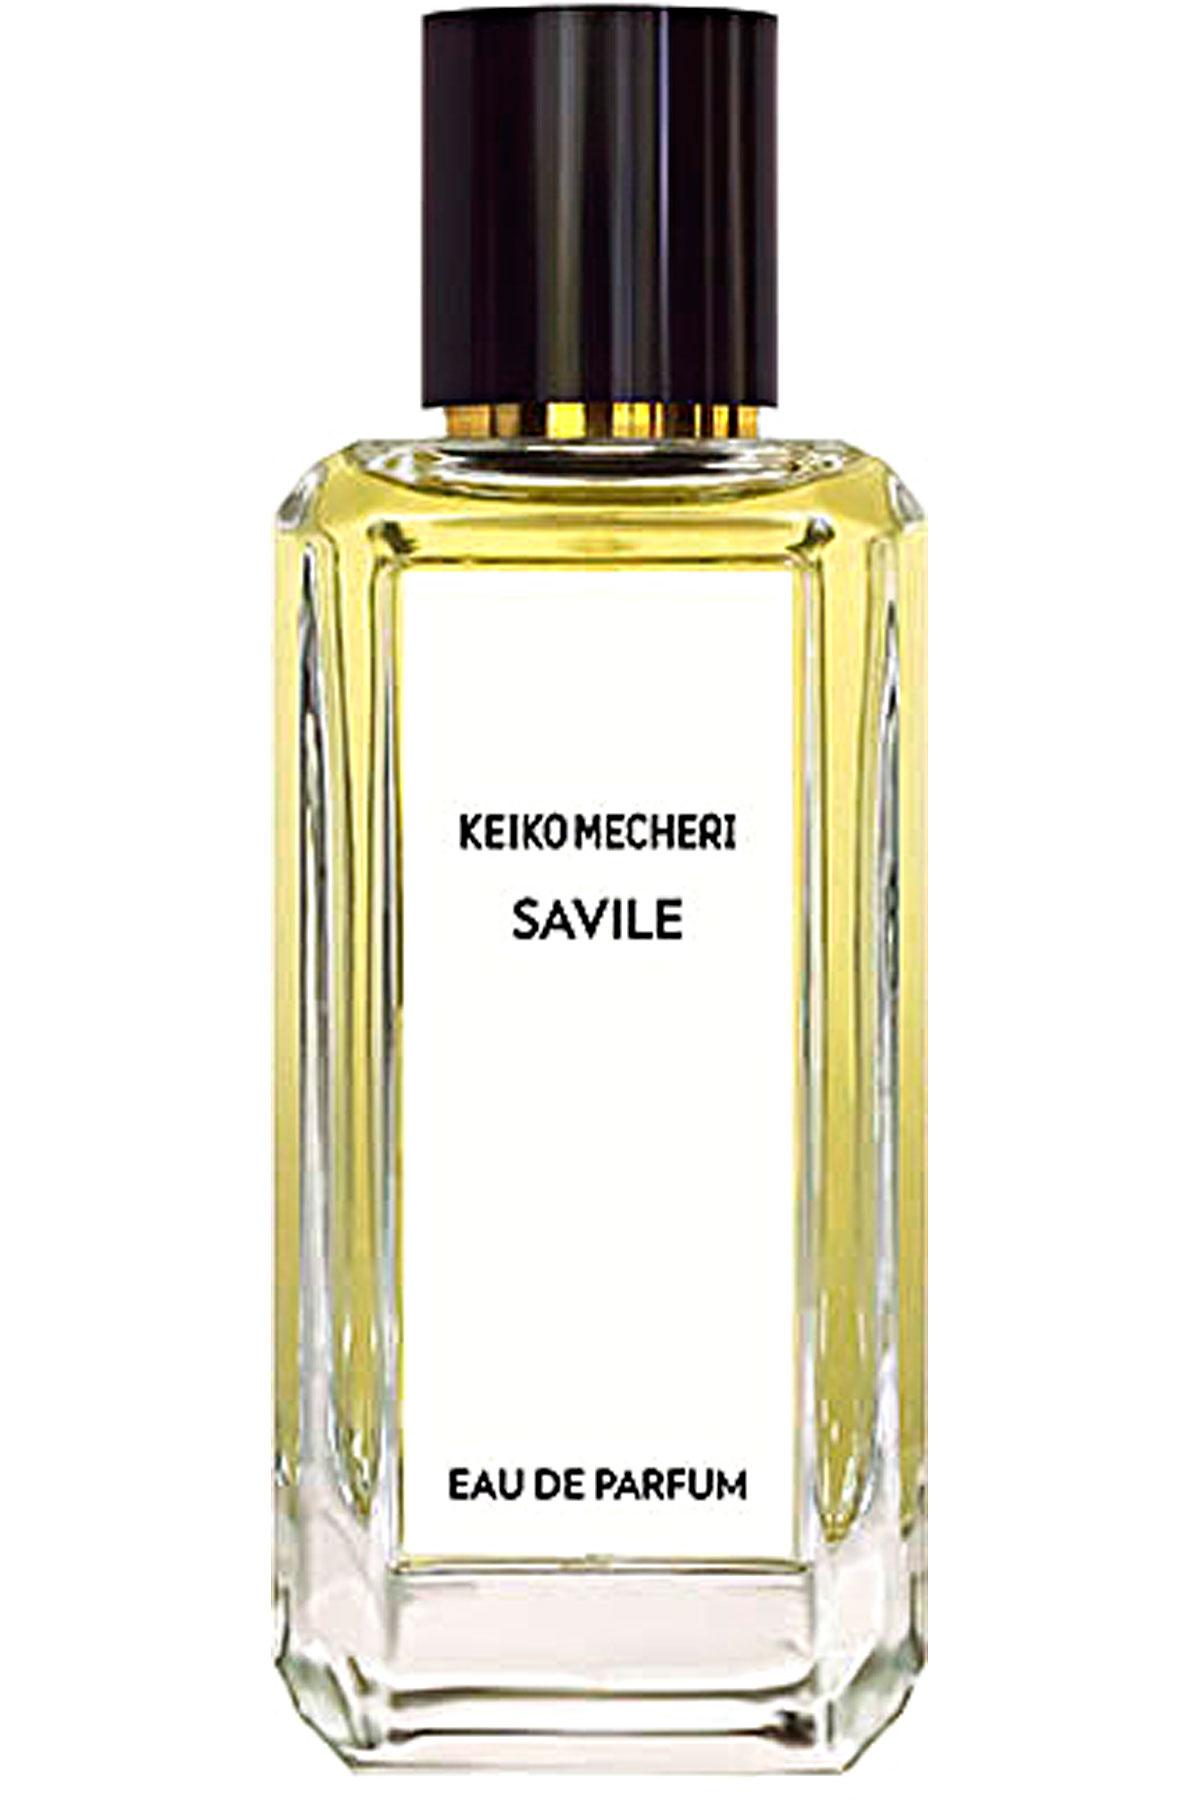 Keiko Mecheri Fragrances for Men, Savile - Eau De Parfum - 100 Ml, 2019, 100 ml